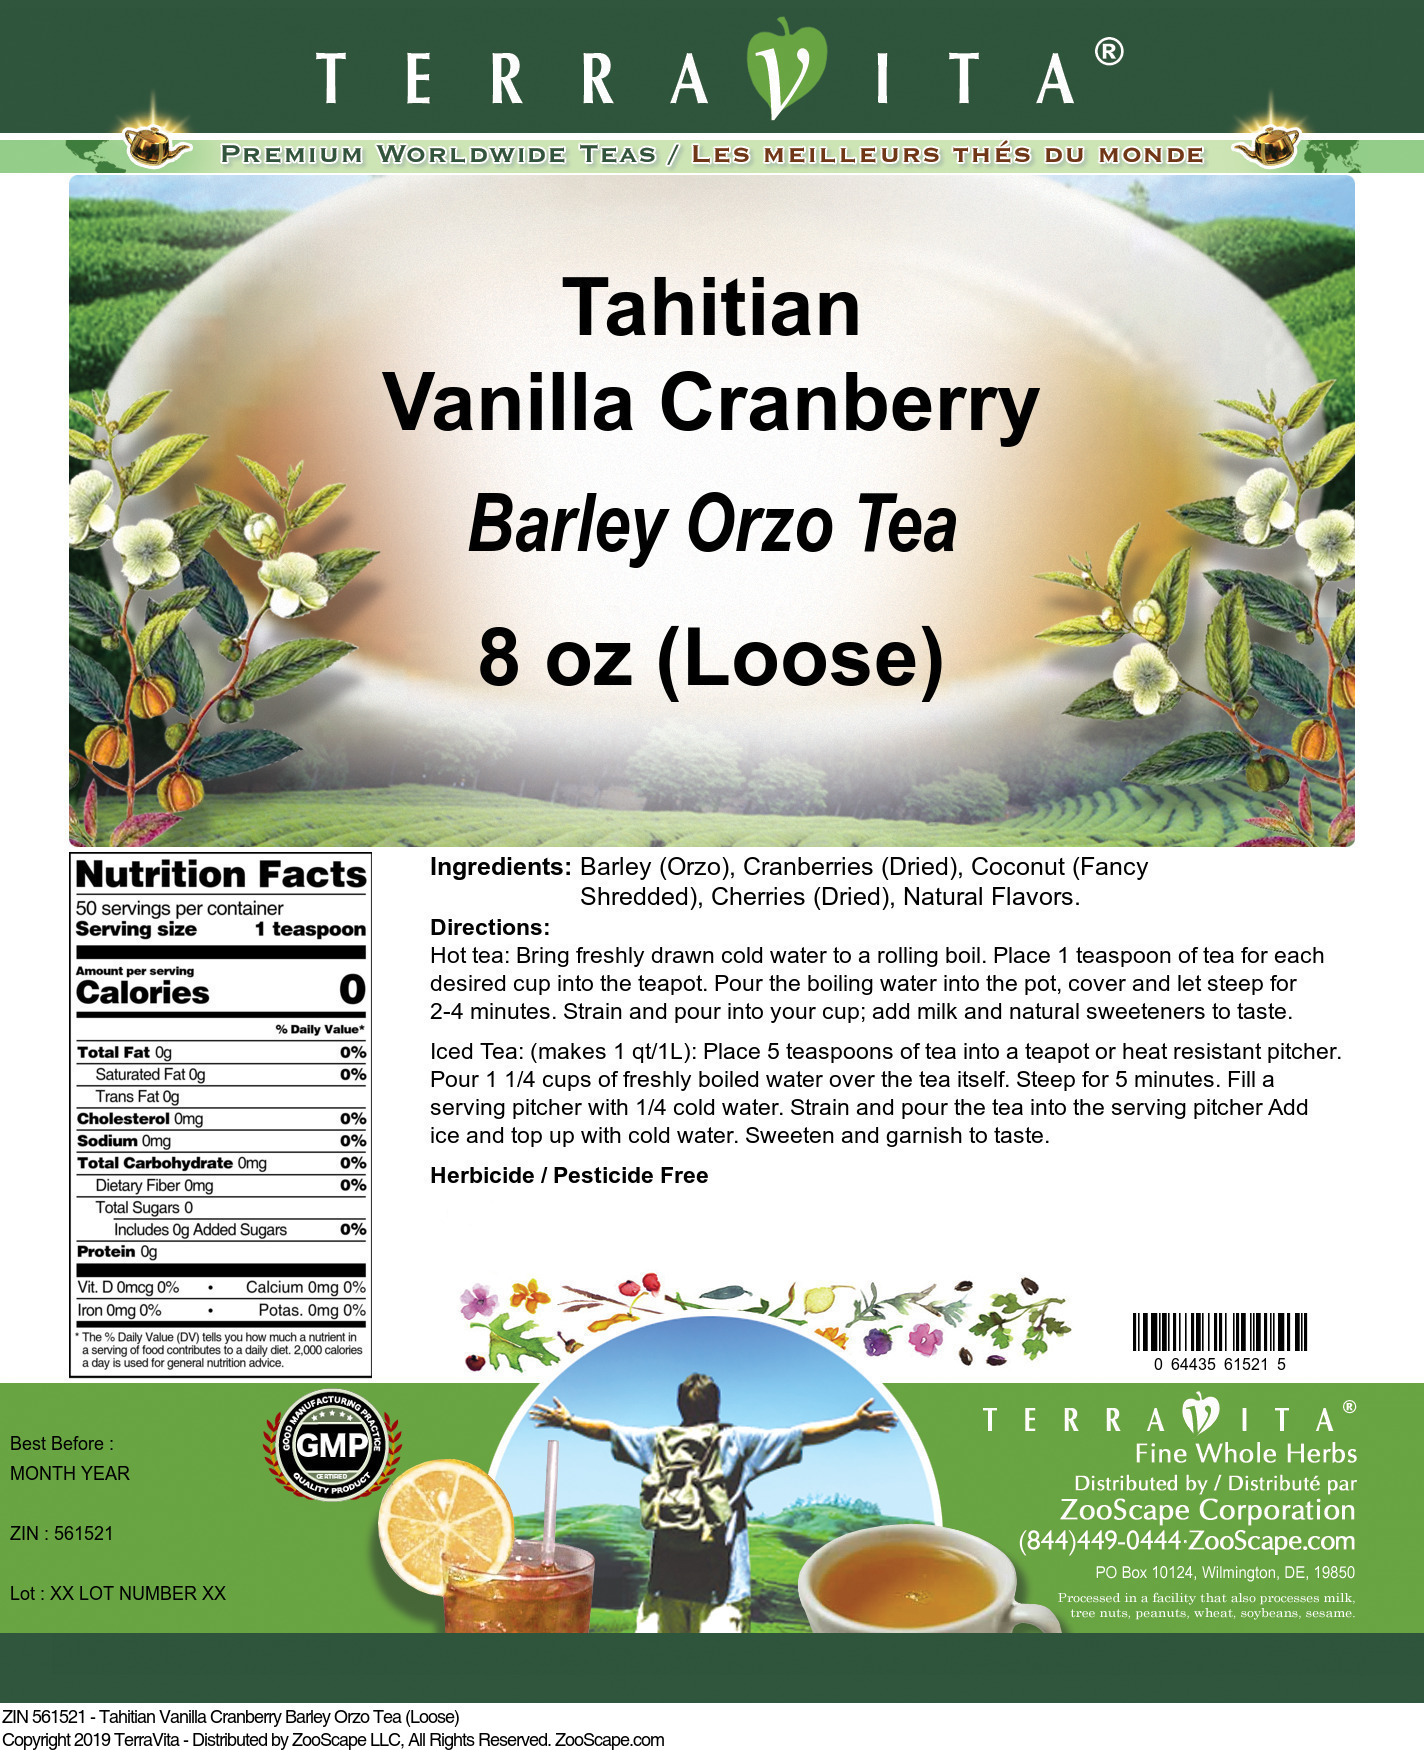 Tahitian Vanilla Cranberry Barley Orzo Tea (Loose)